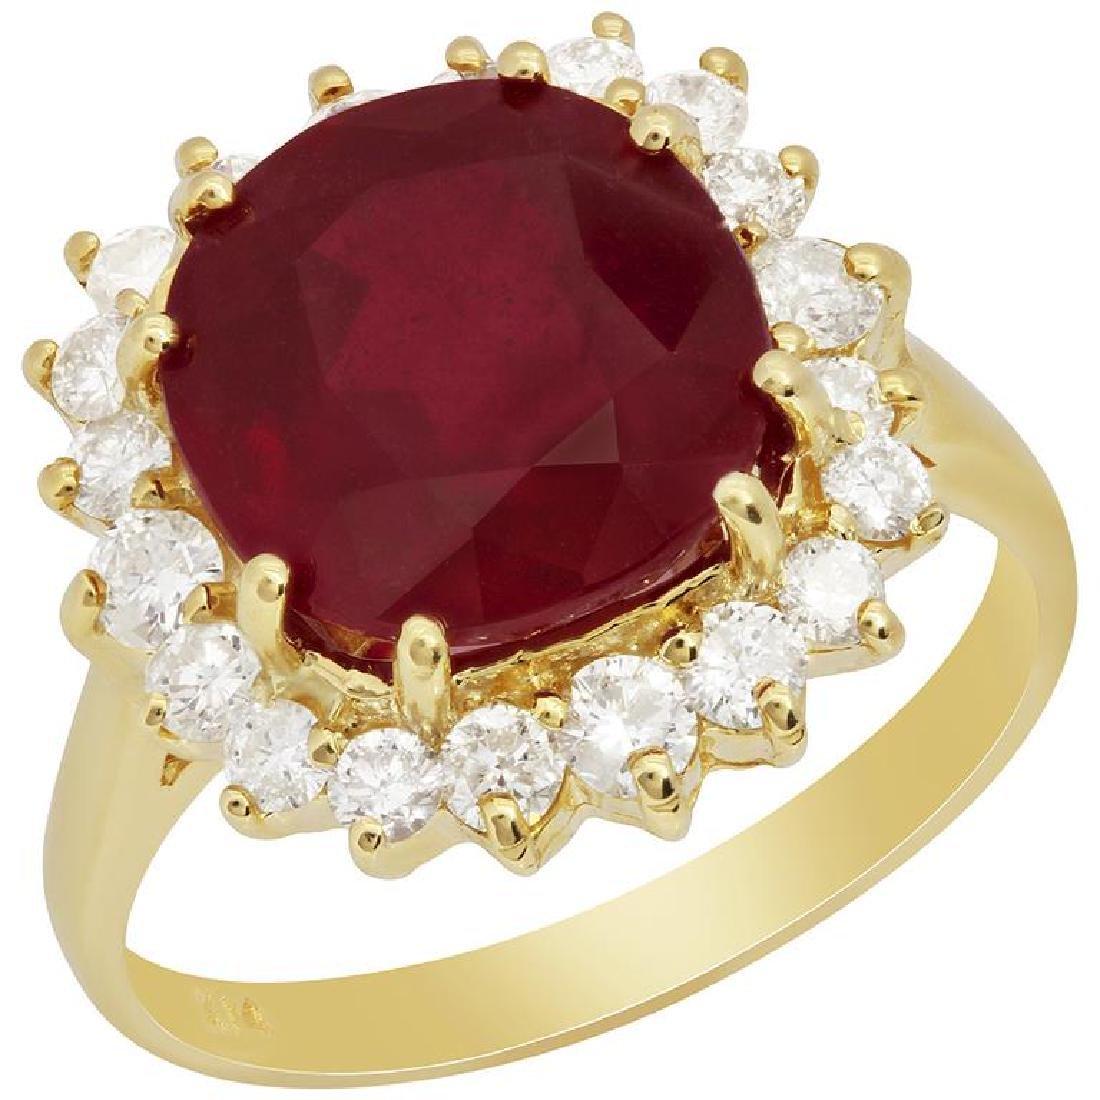 14k Yellow Gold 6.16ct Ruby 0.81ct Diamond Ring